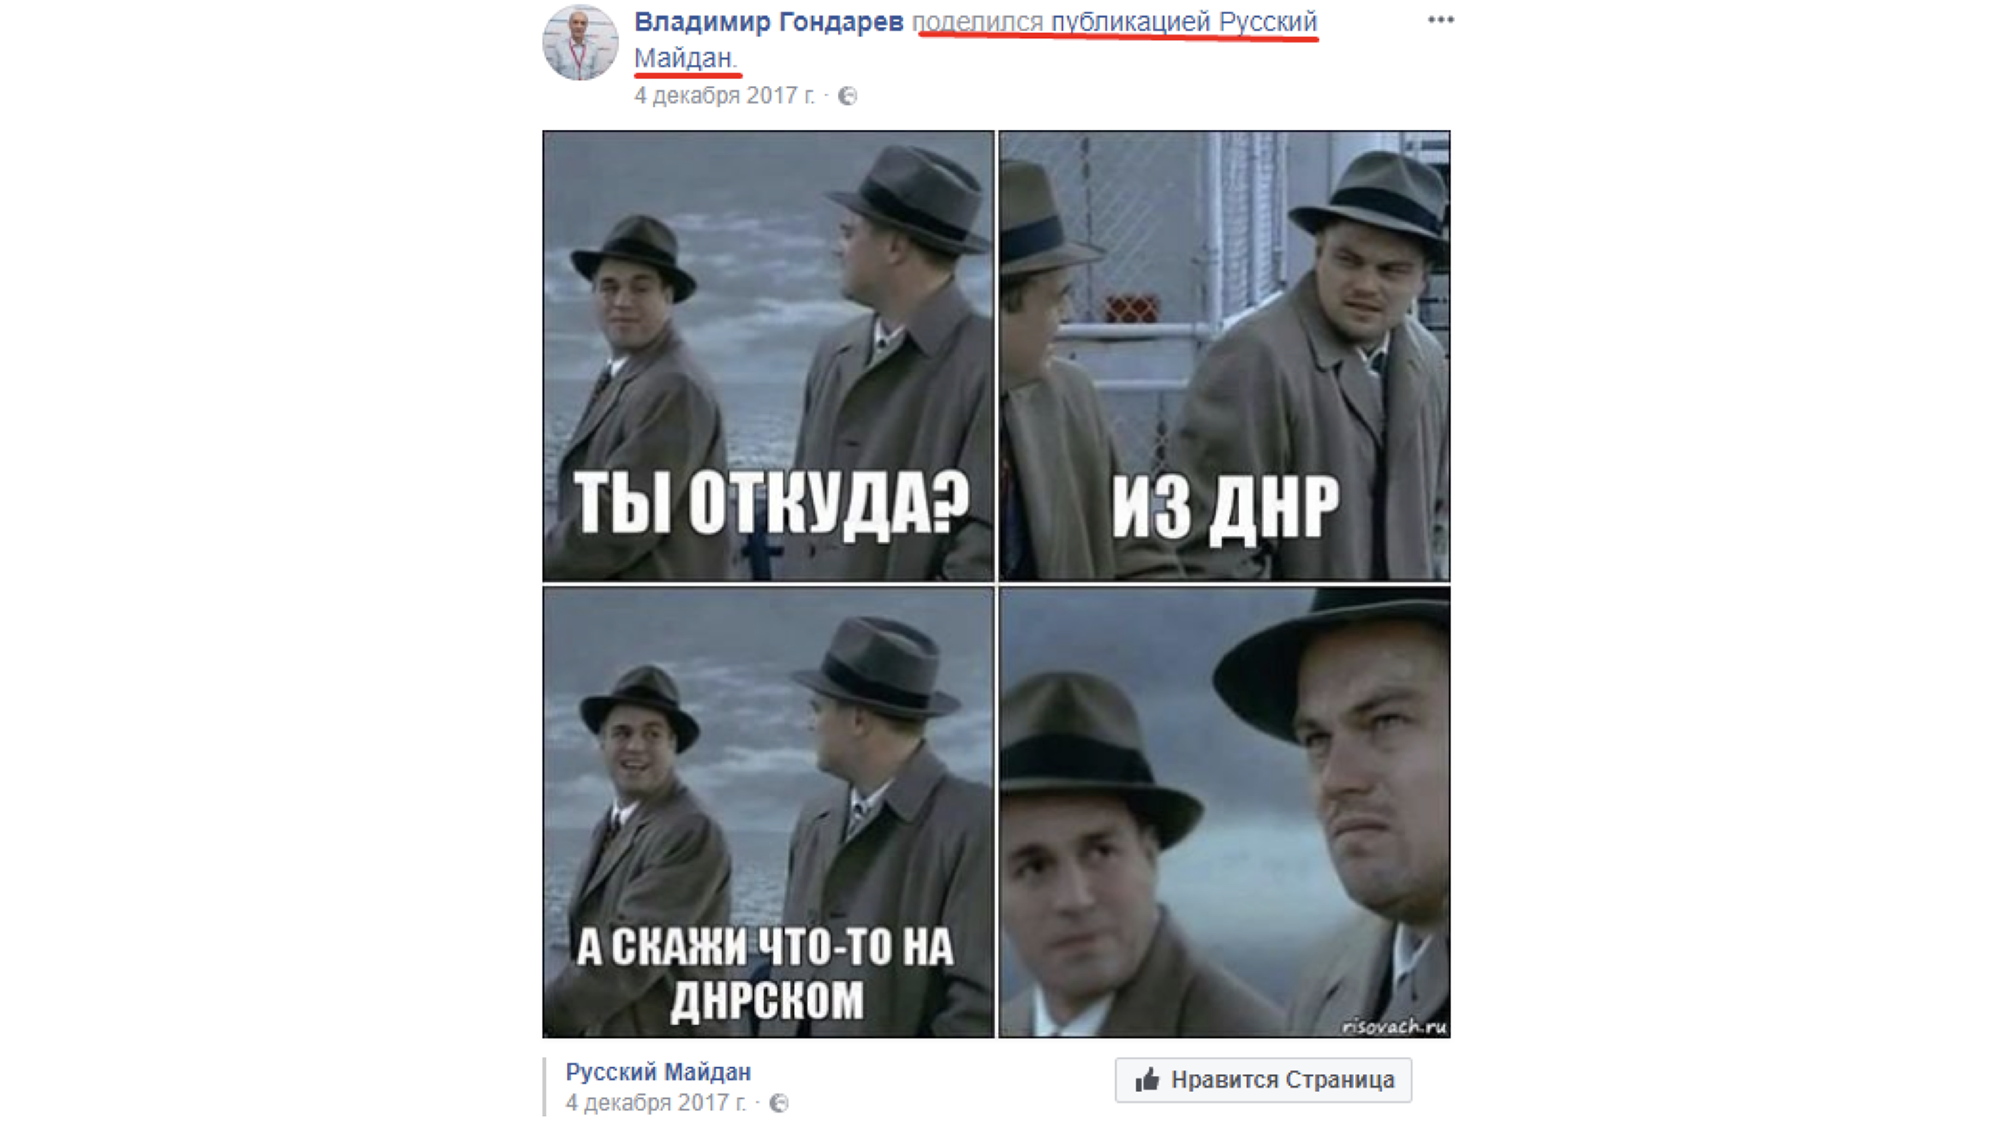 "<p>Фото: &copy; <a href=""https://www.facebook.com/profile.php?id=100003405540458&amp;lst=1549712640%3A100003405540458%3A1516786818"" target=""_blank"">www.facebook.com/Владимир Гондарев</a></p>"